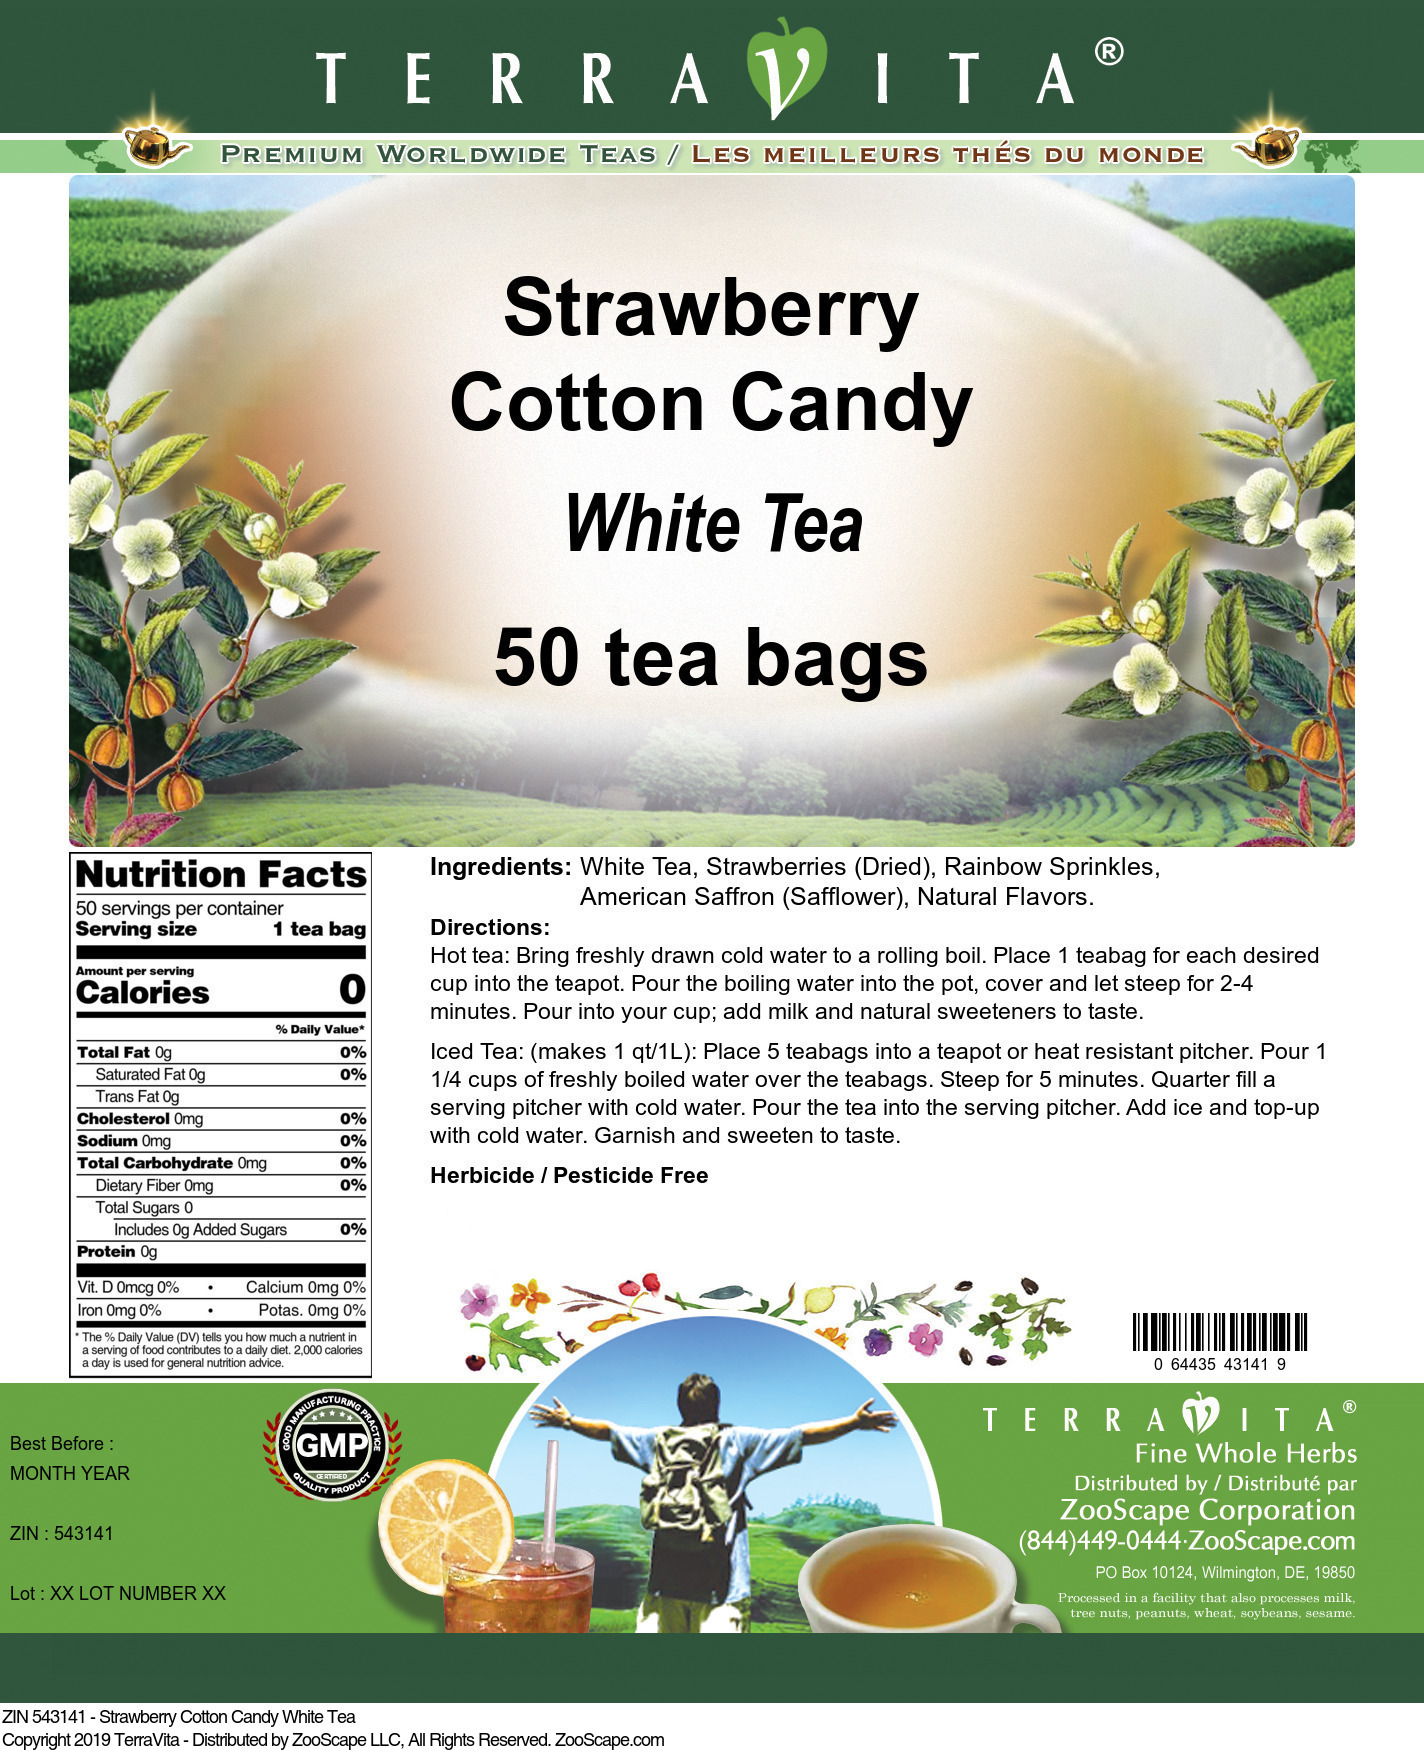 Strawberry Cotton Candy White Tea